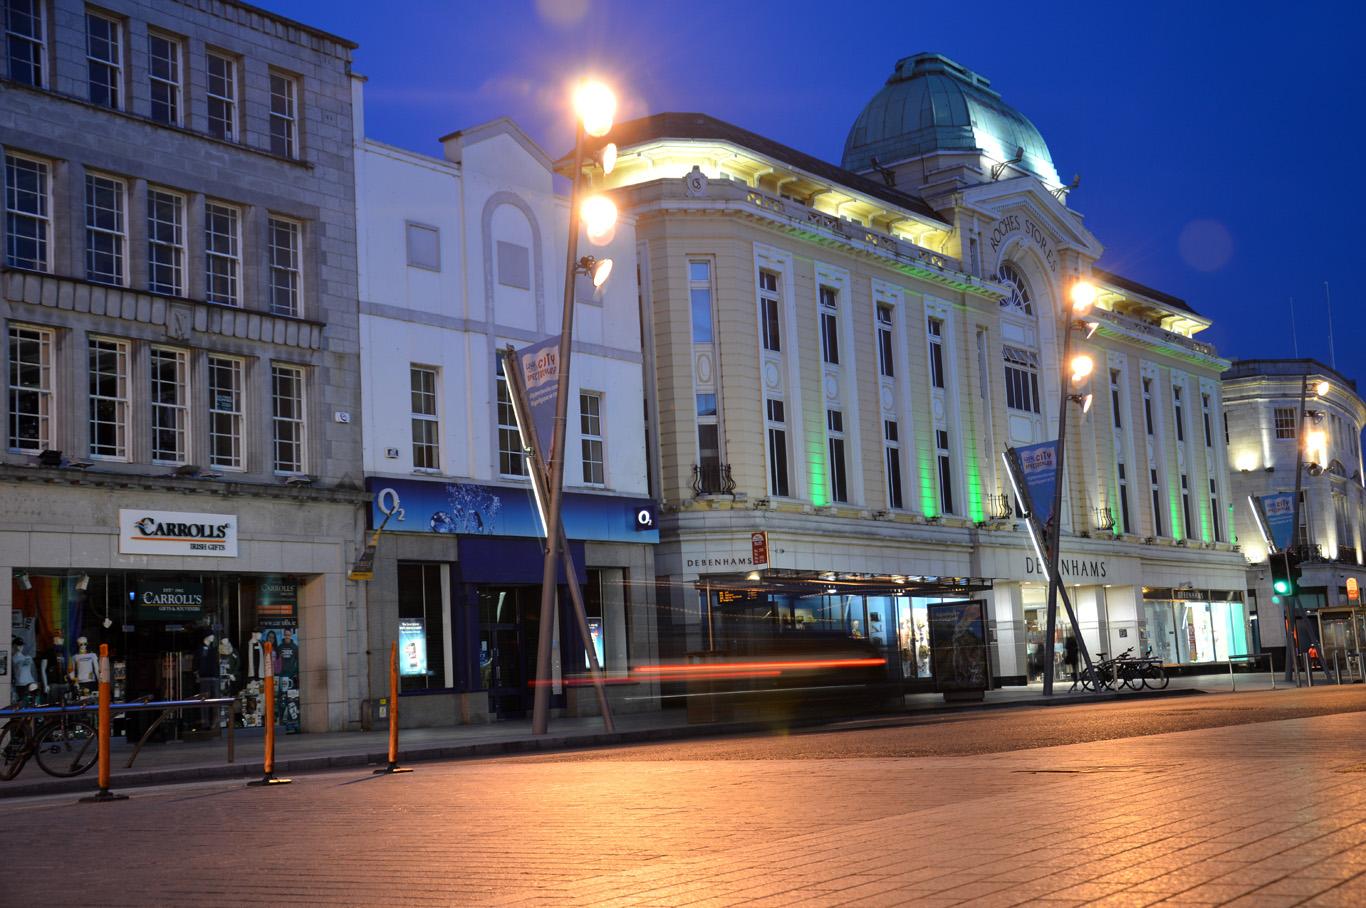 St. Patrick's street at night